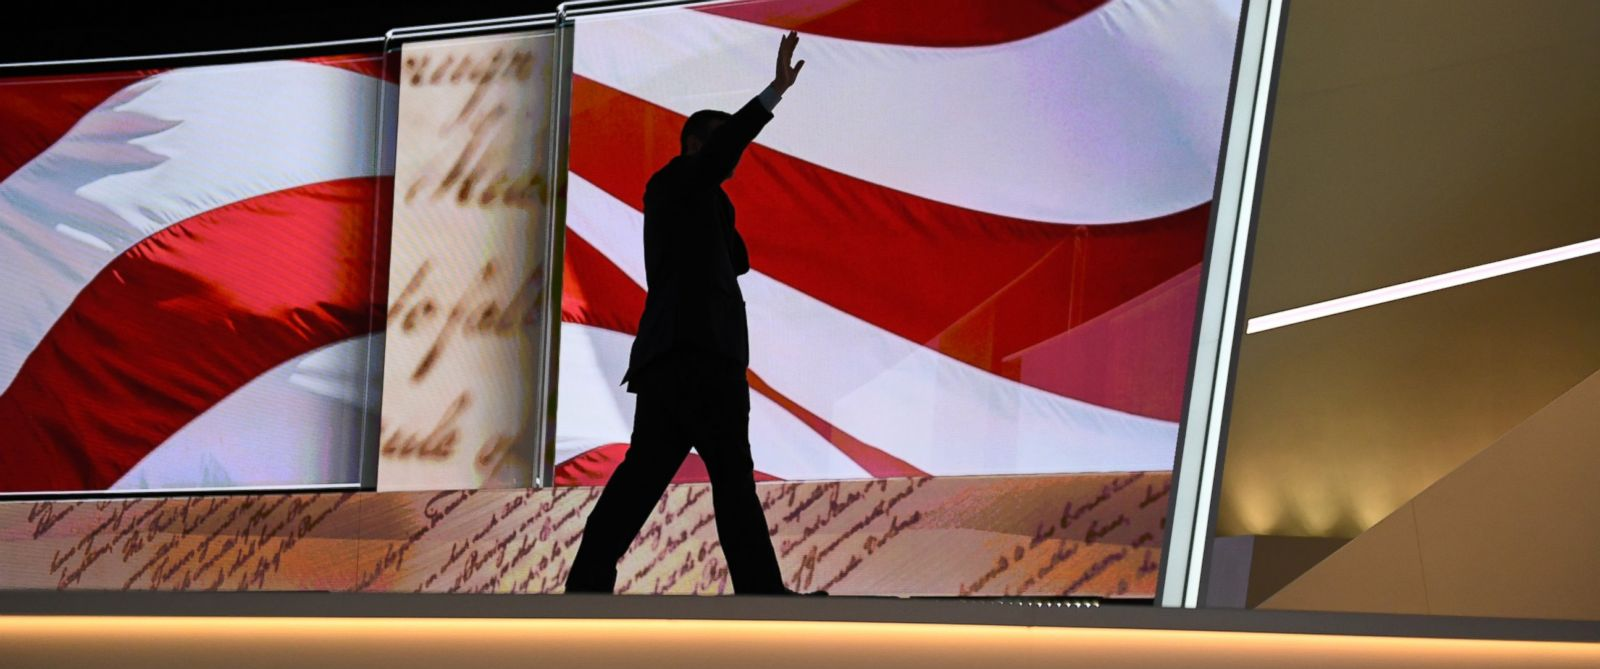 PHOTO: Jabin Botsford/The Washington Post/Getty Images